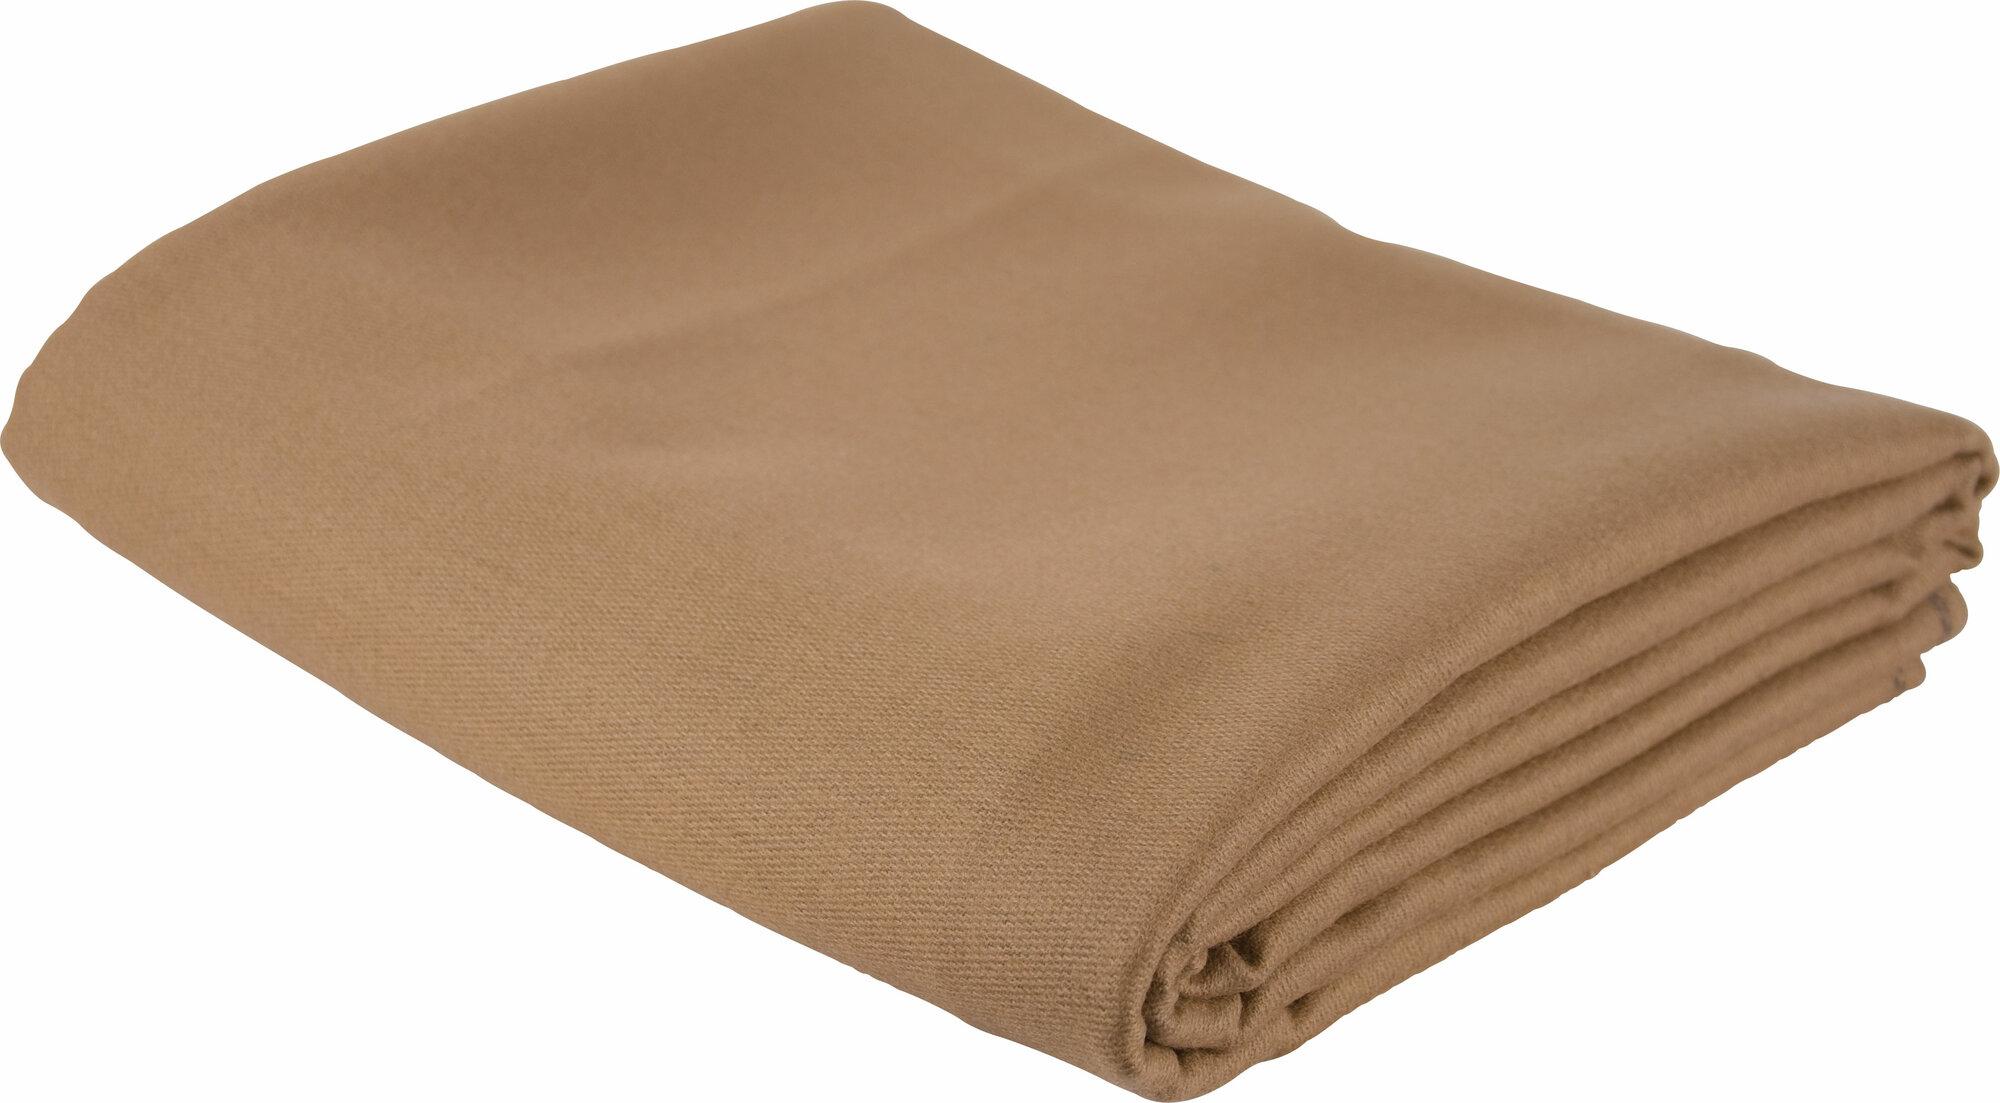 Simonis 9 39 cut 760 pool table cloth camel for 10 foot table cloth